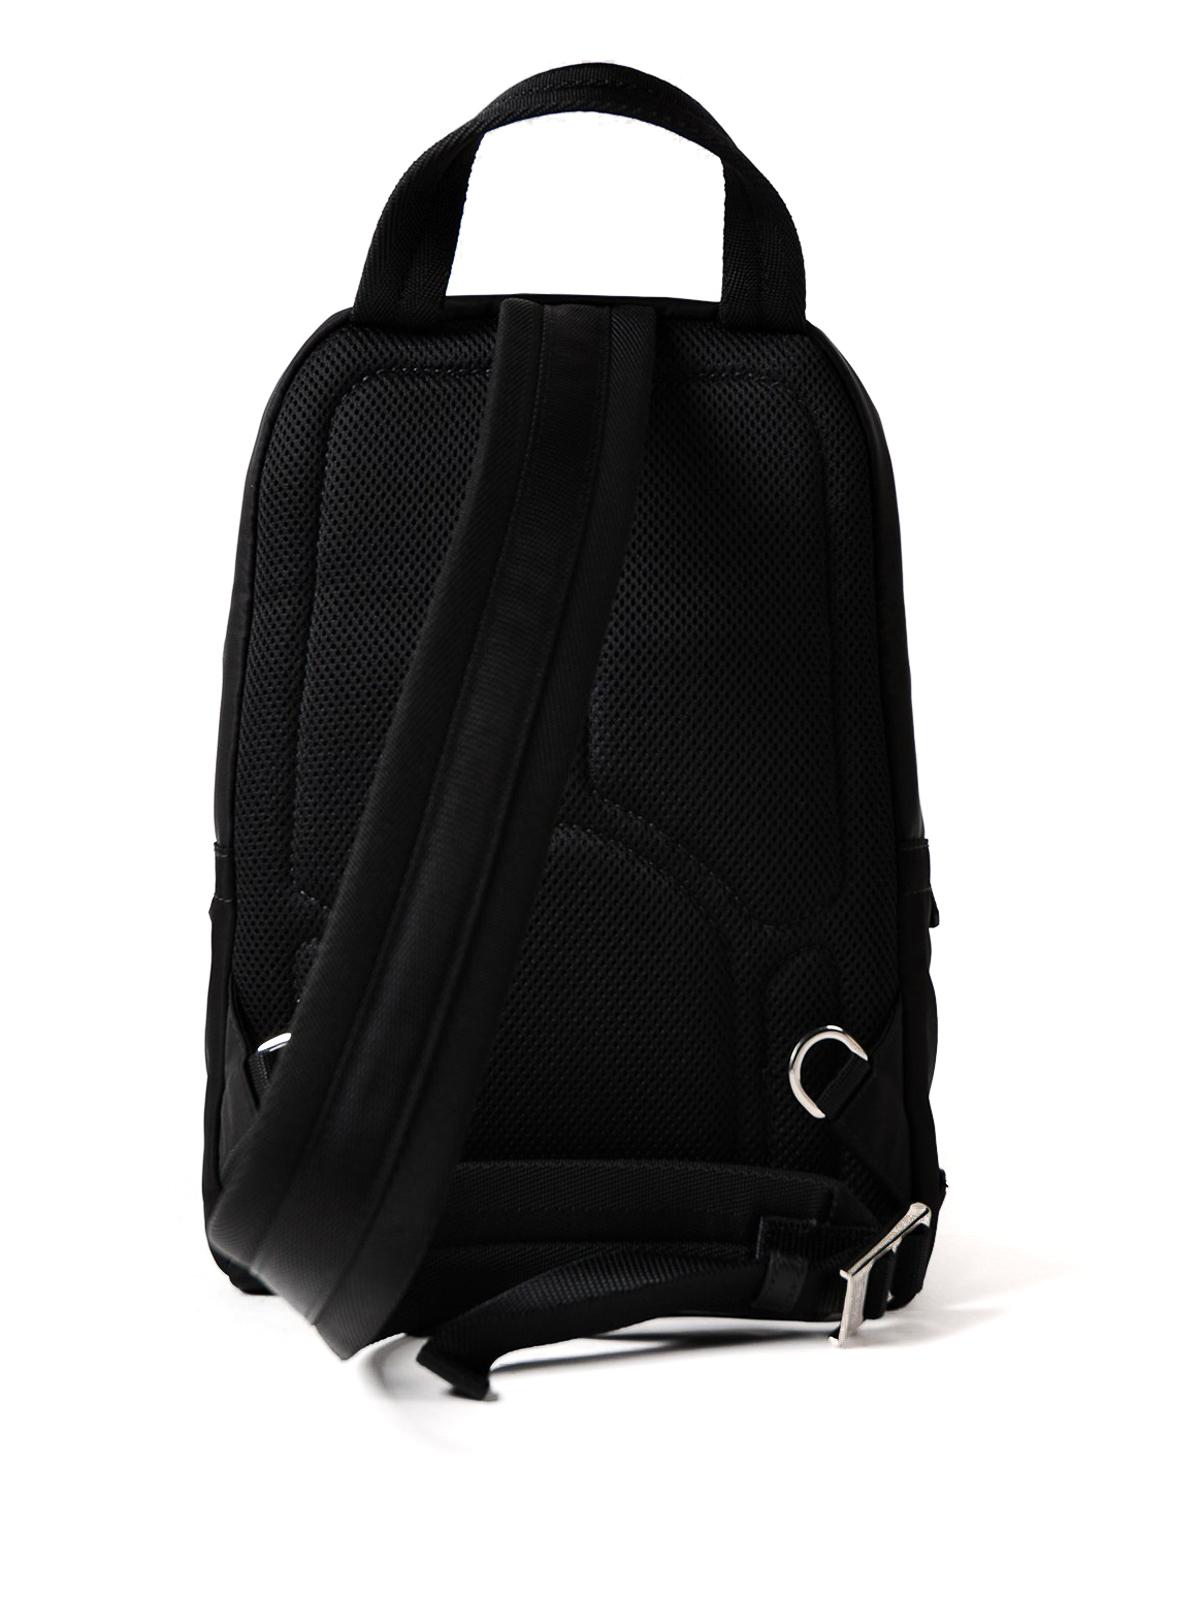 8db8cdfd7a22 Prada - Black nylon one shoulder backpack - backpacks - 2VZ013 973 002